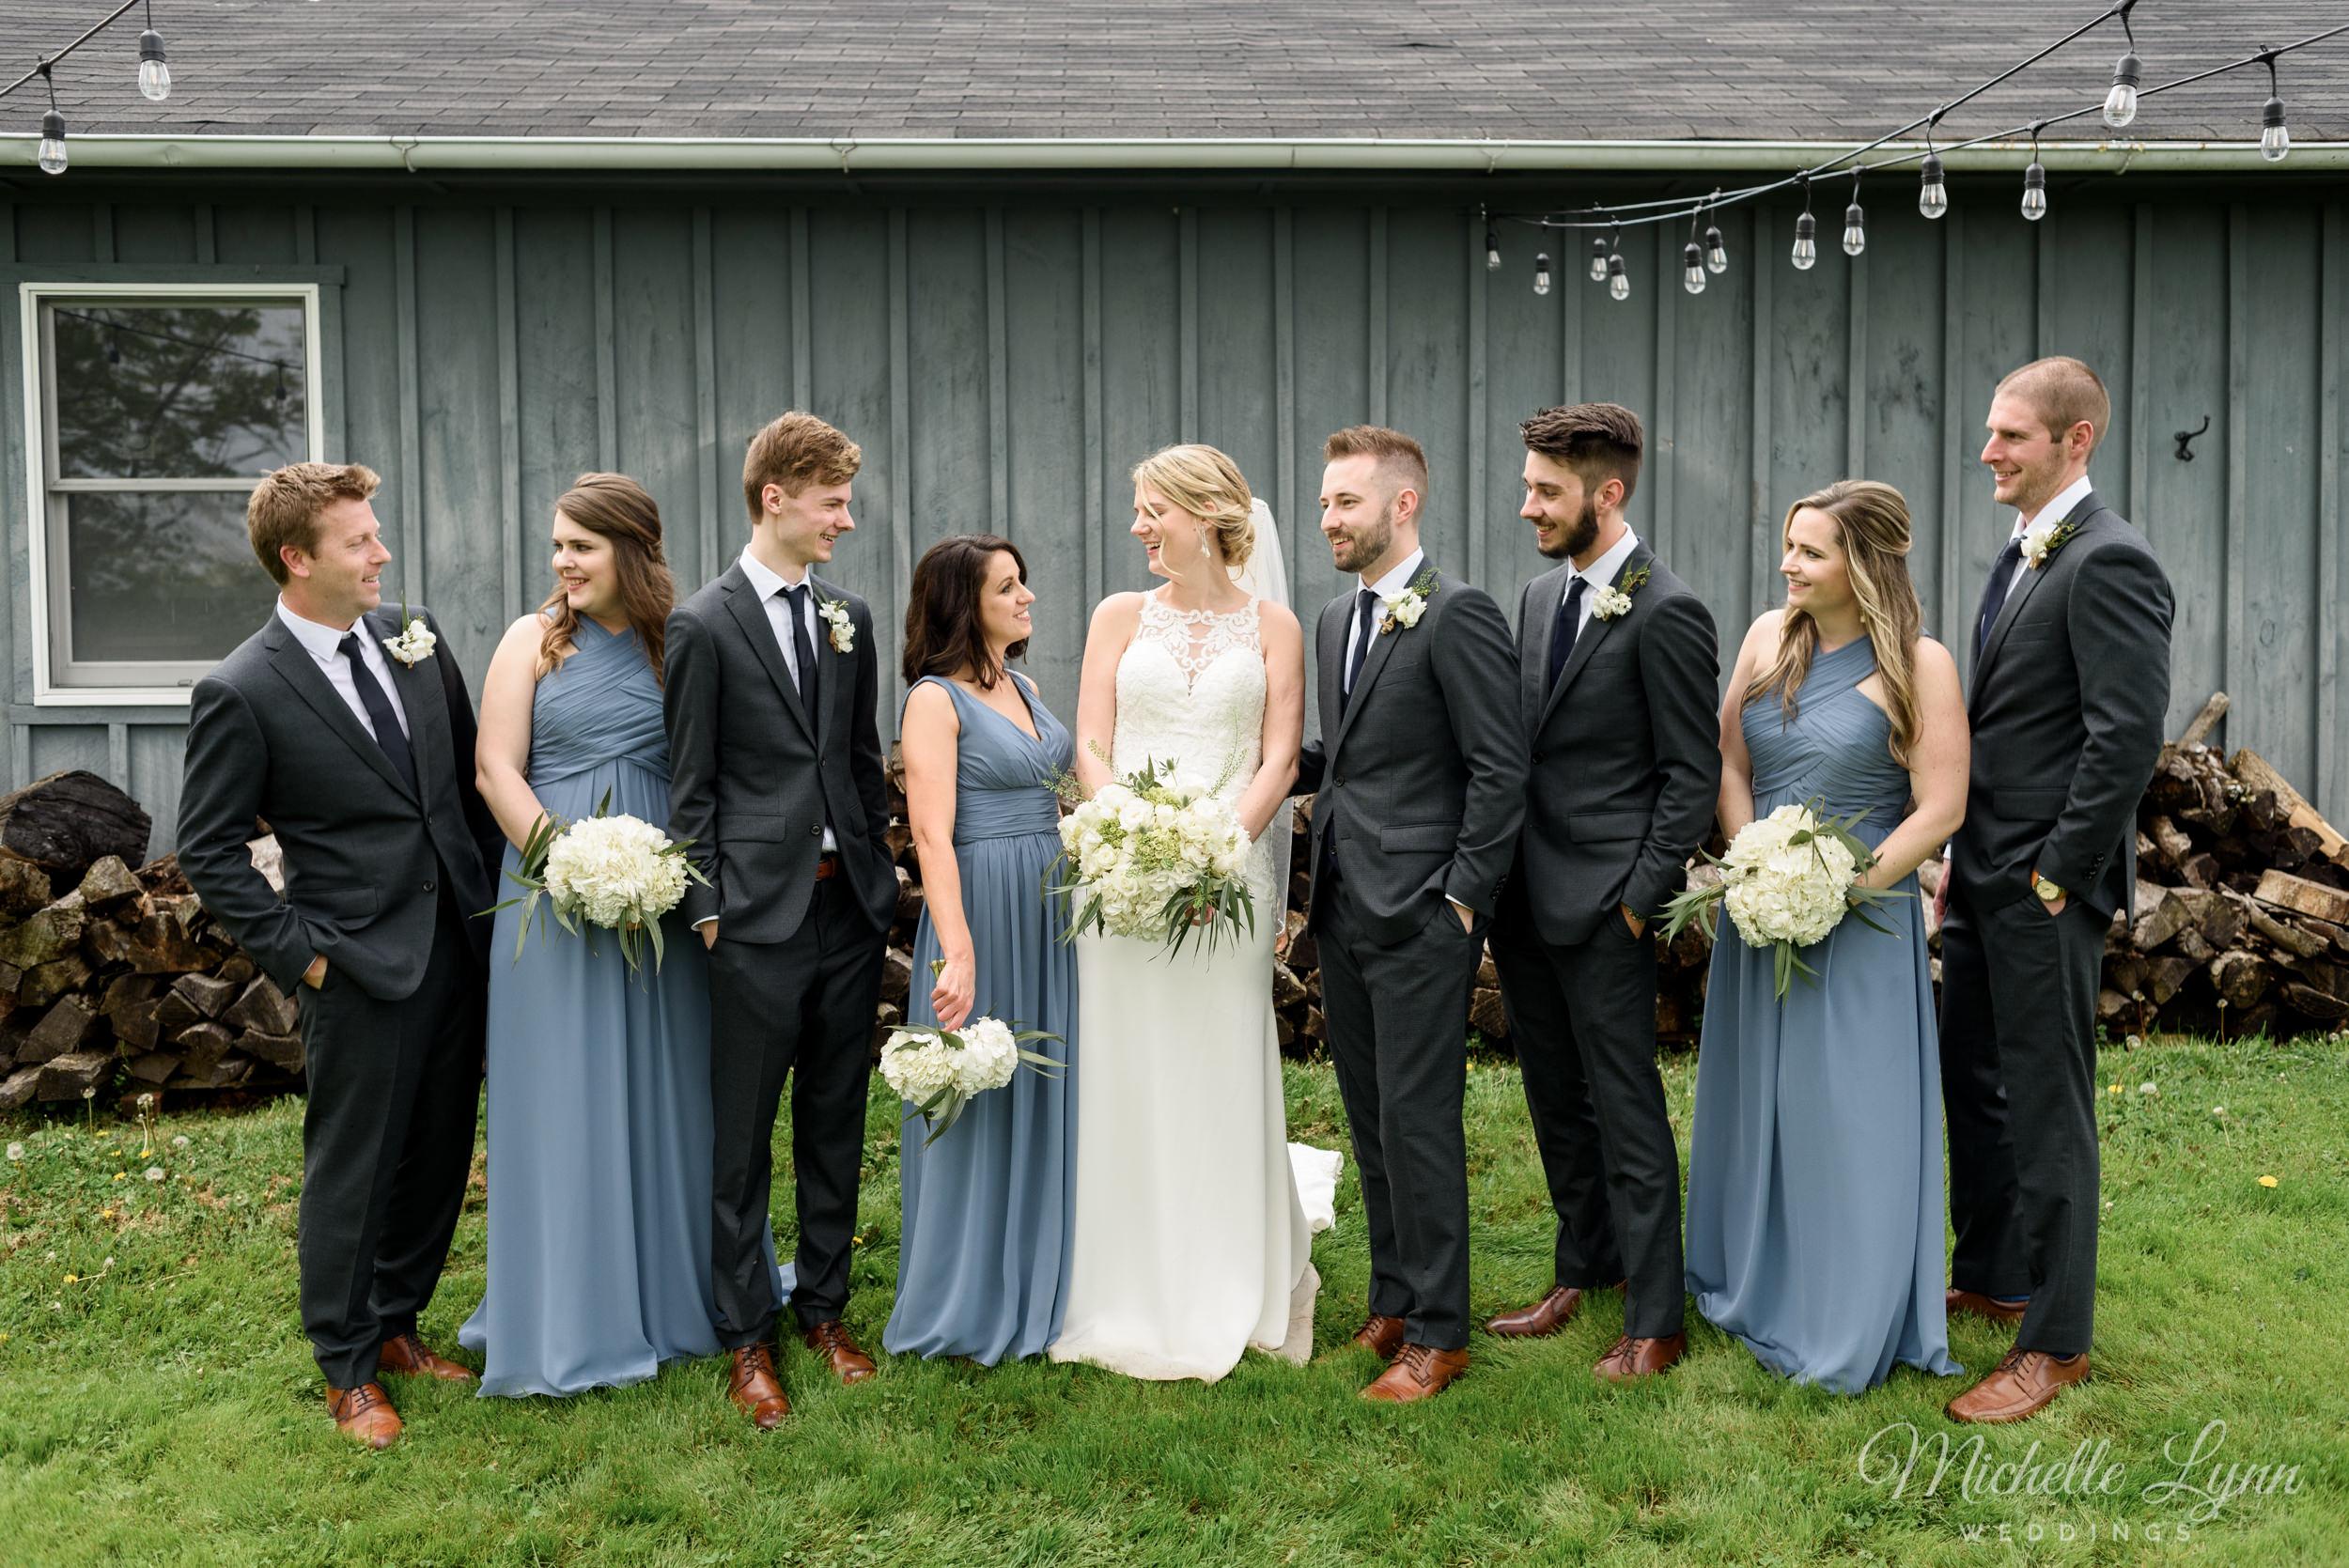 mlw-the-farm-bakery-and-events-wedding-photos-48.jpg